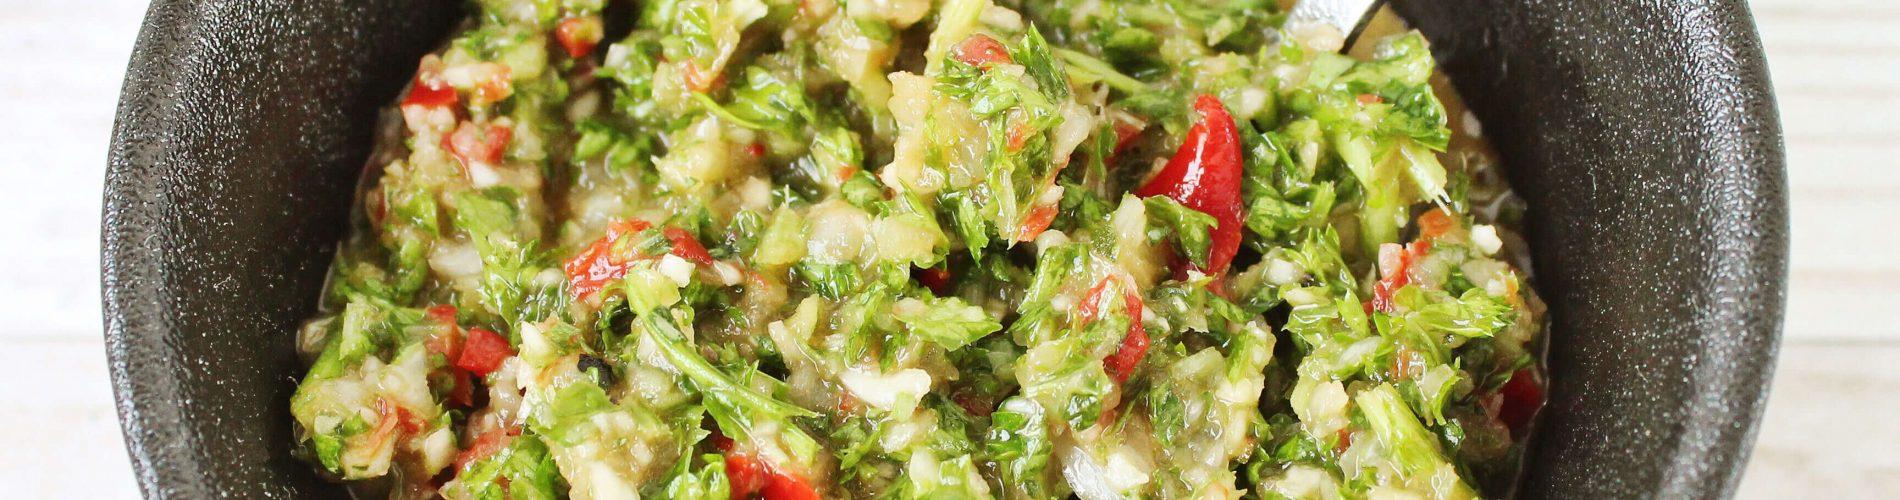 Chimichurri - salsa bij rundvlees